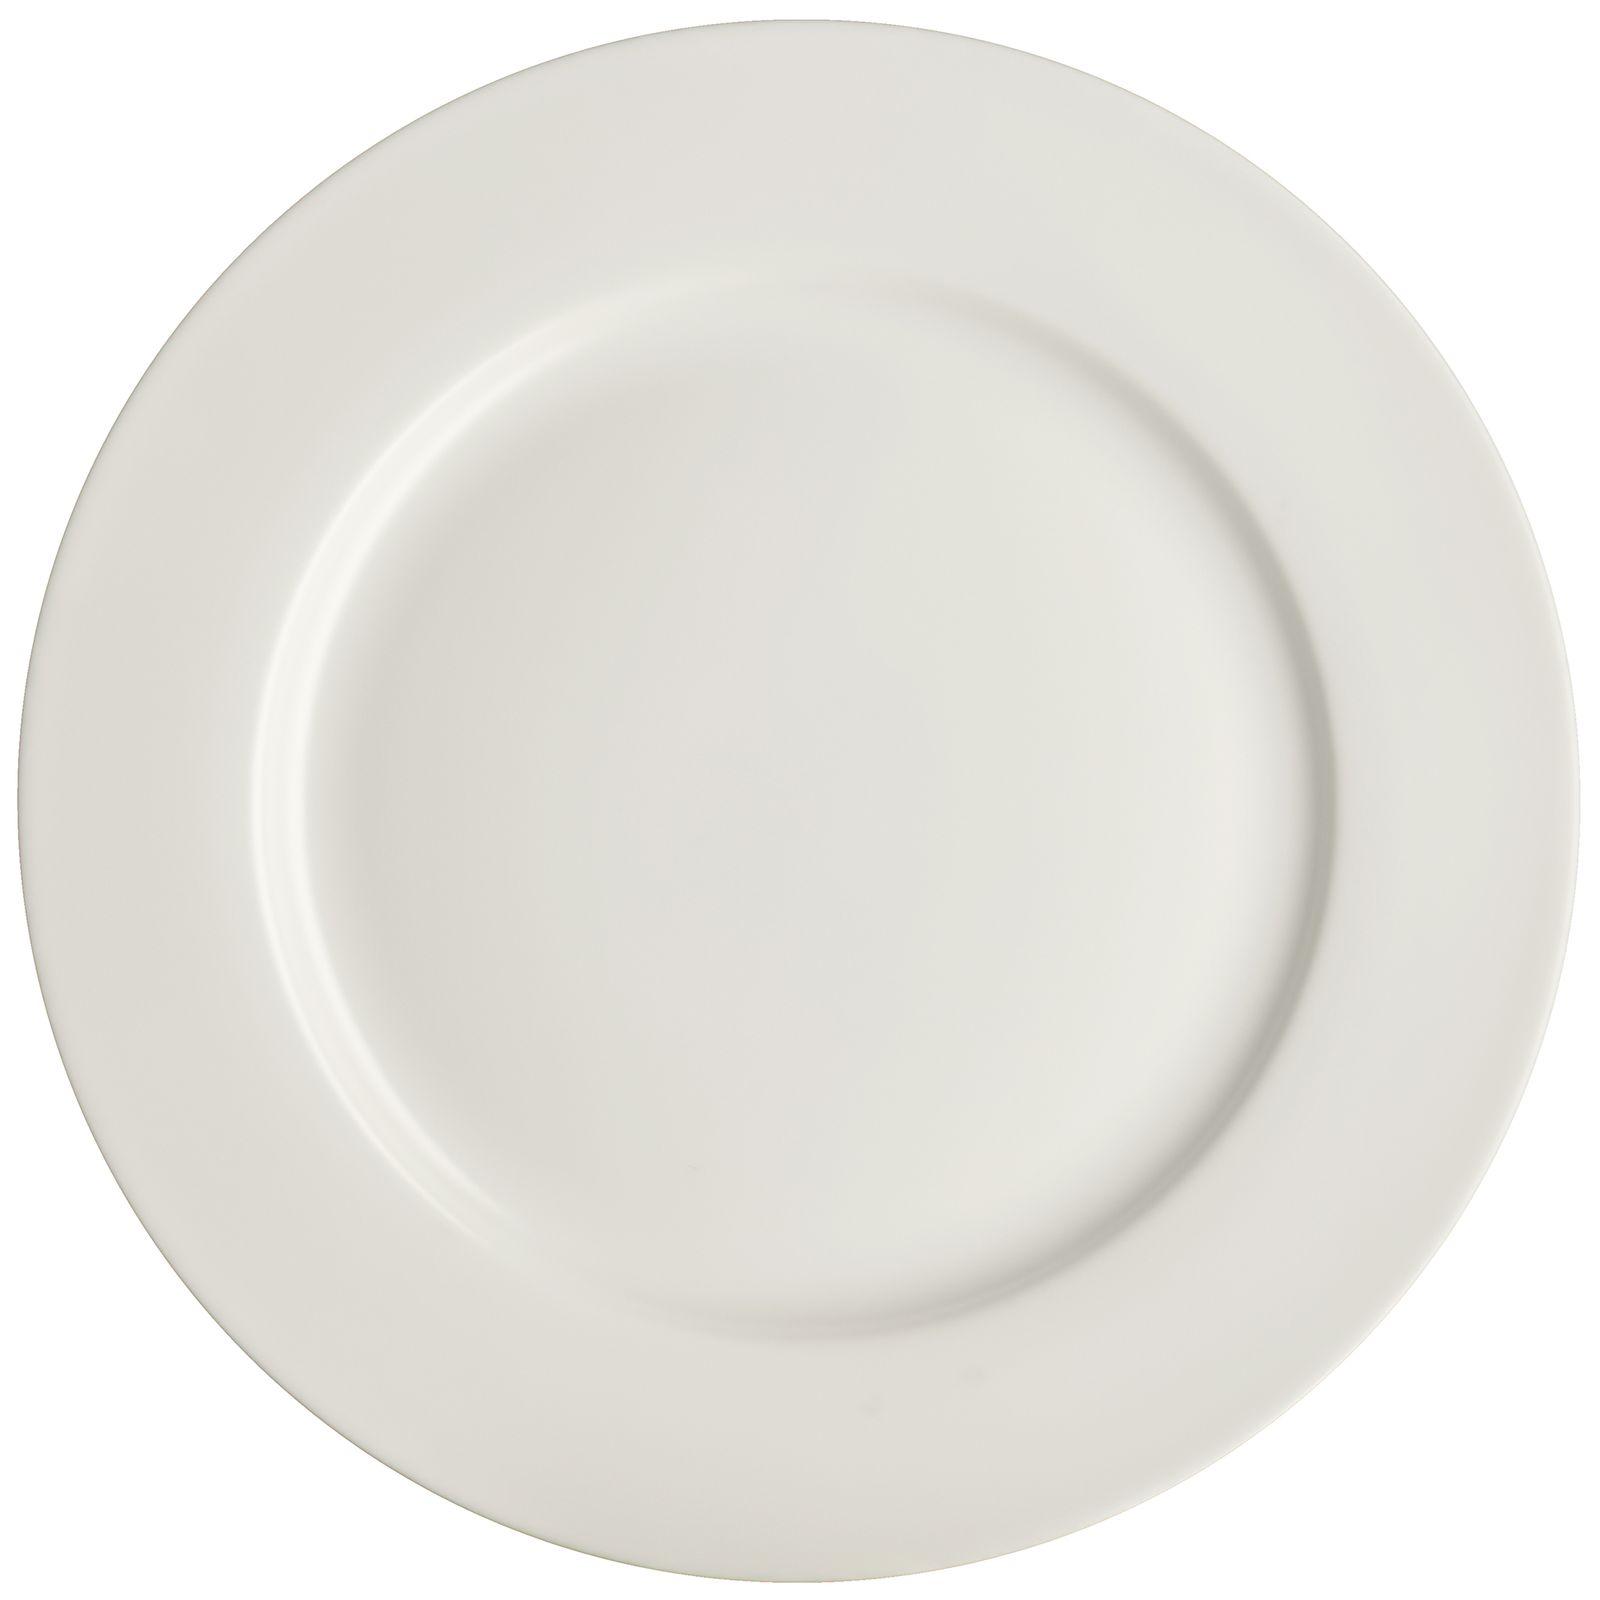 Porcelánový plytký tanier Aura White 27 cm AMBITION